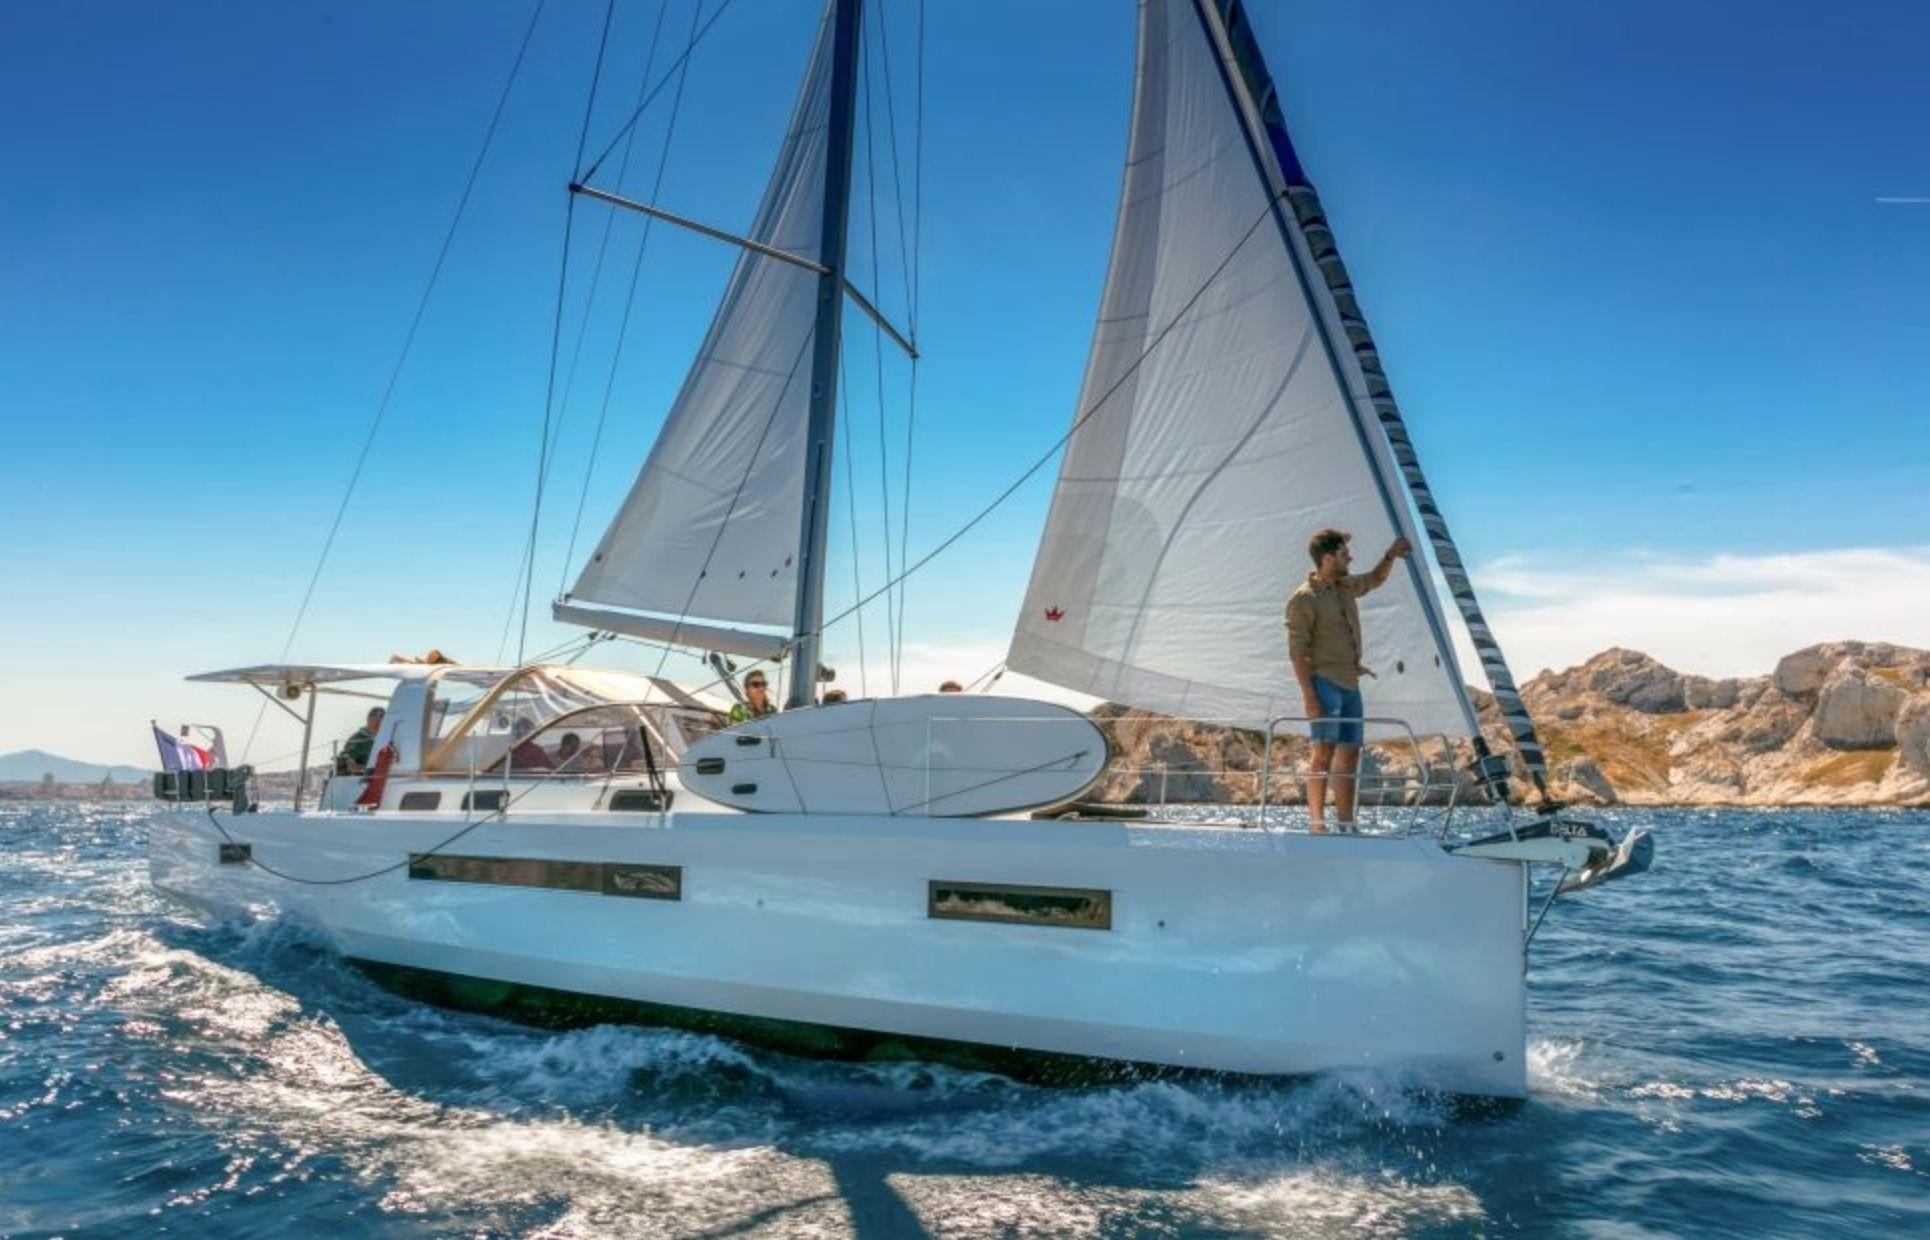 Jeanneau Sun Loft 47 - 6 + 1 Cabins - 2020 - Gocek - Bodrum - Marmaris